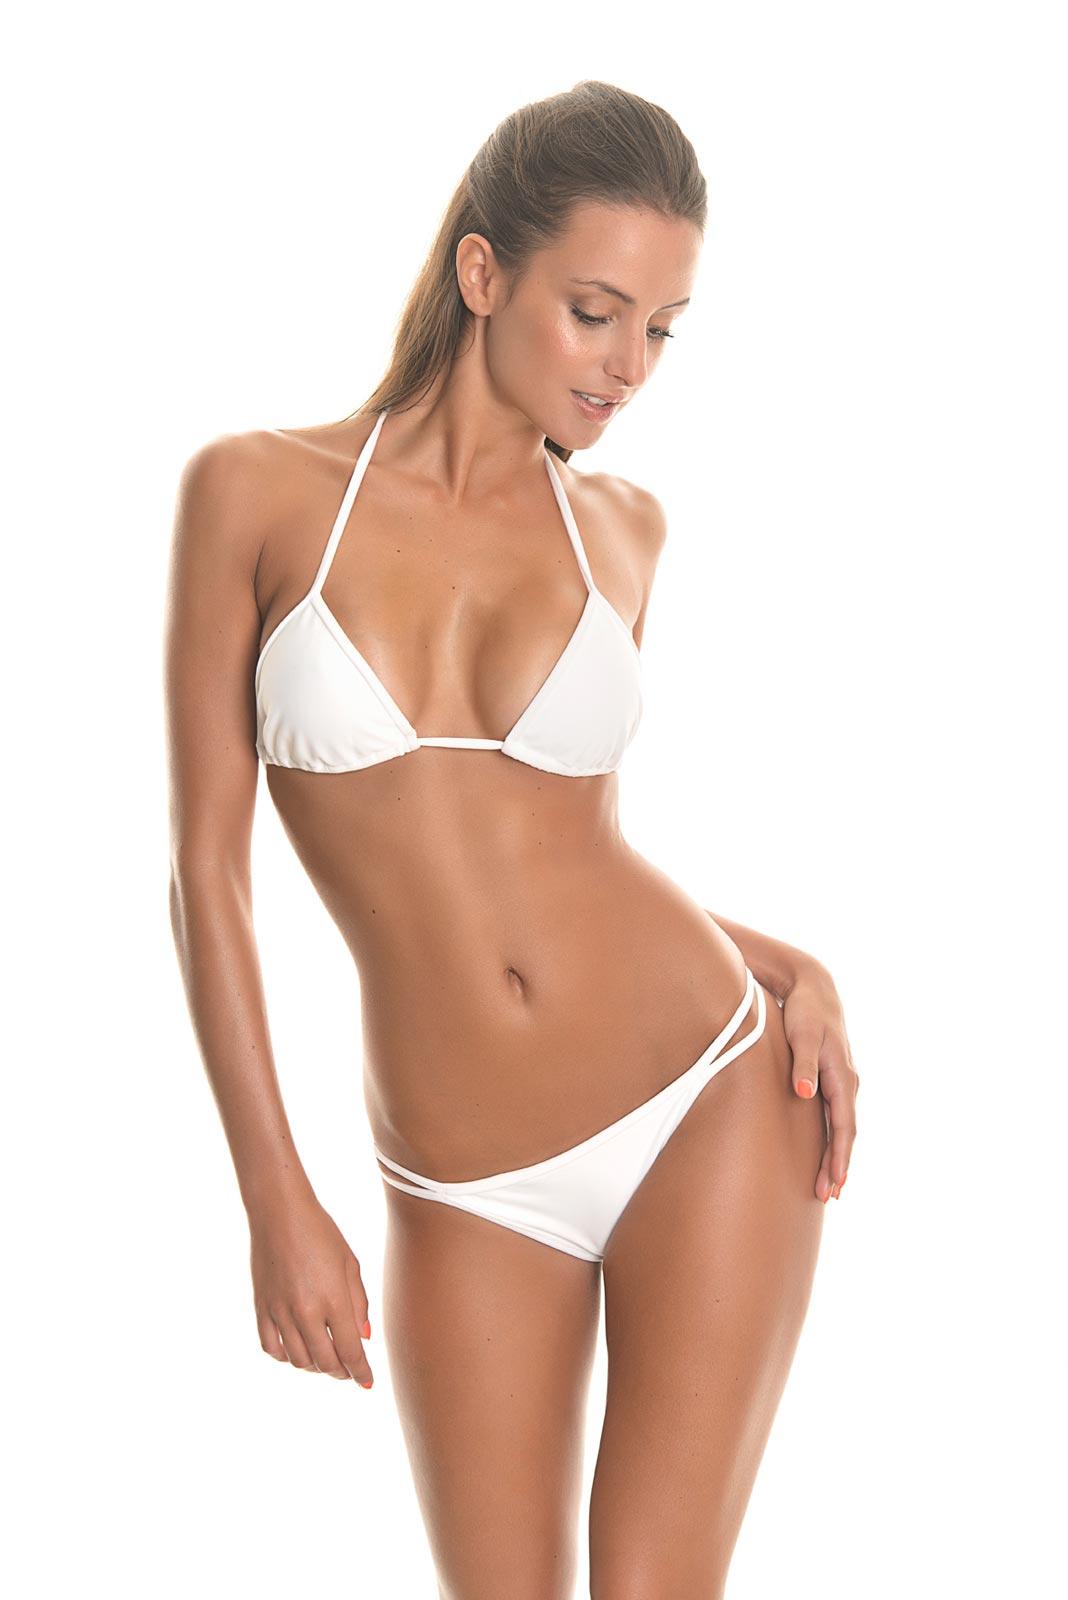 brazilian bikini bottoms are generally high cut and rather low rise